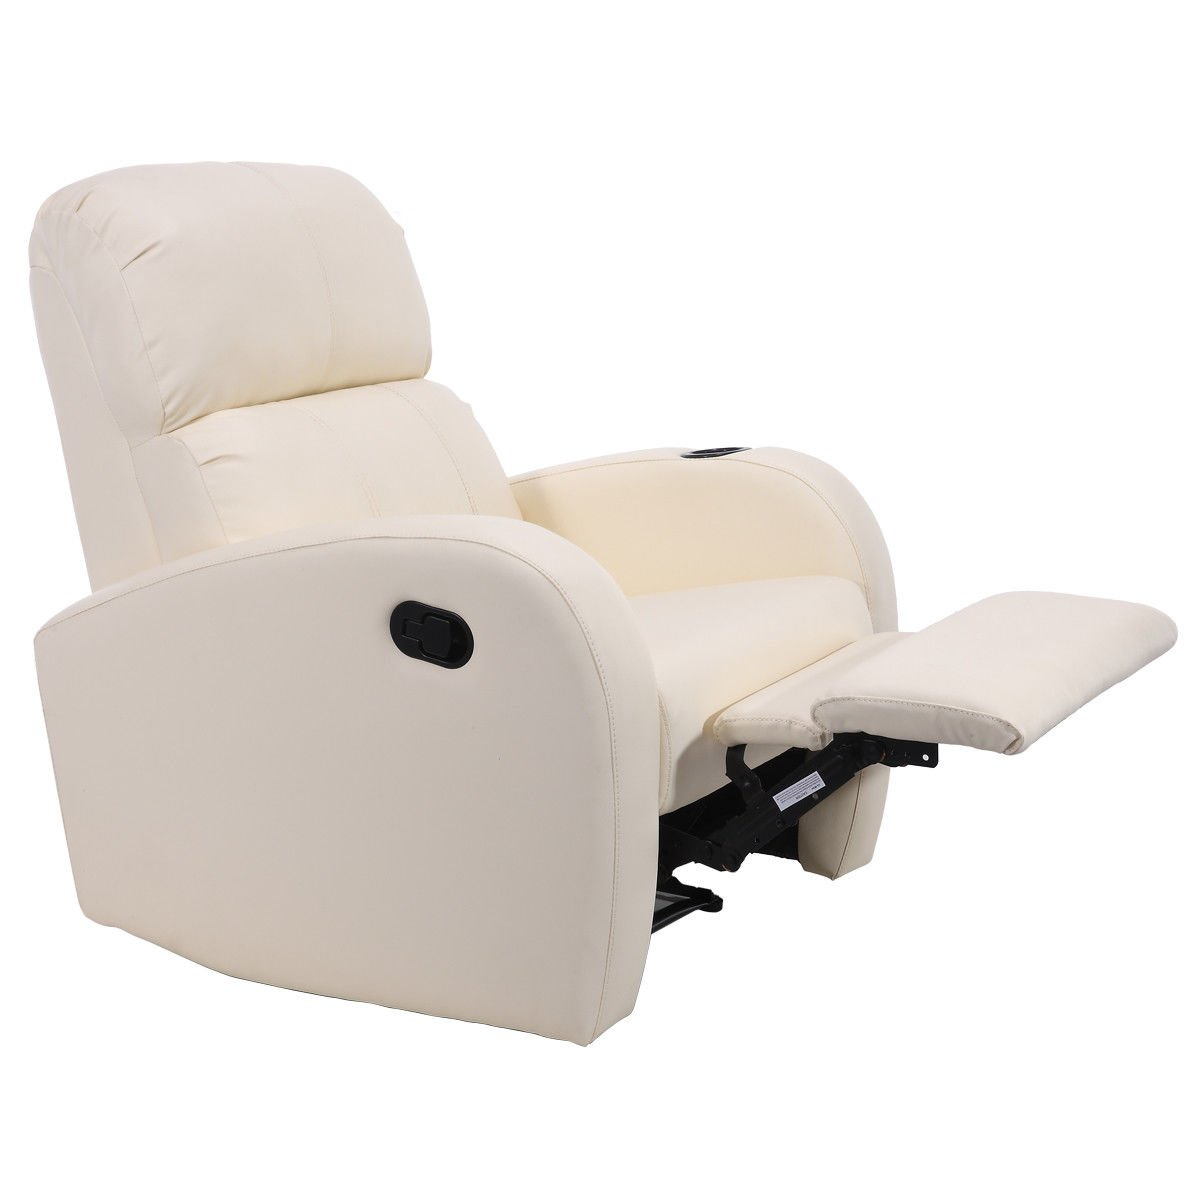 Giantex Recliner Chair Single Sofa PU Leather Lounger Club Manual Ergonomic Home Theater Seating (Beige)